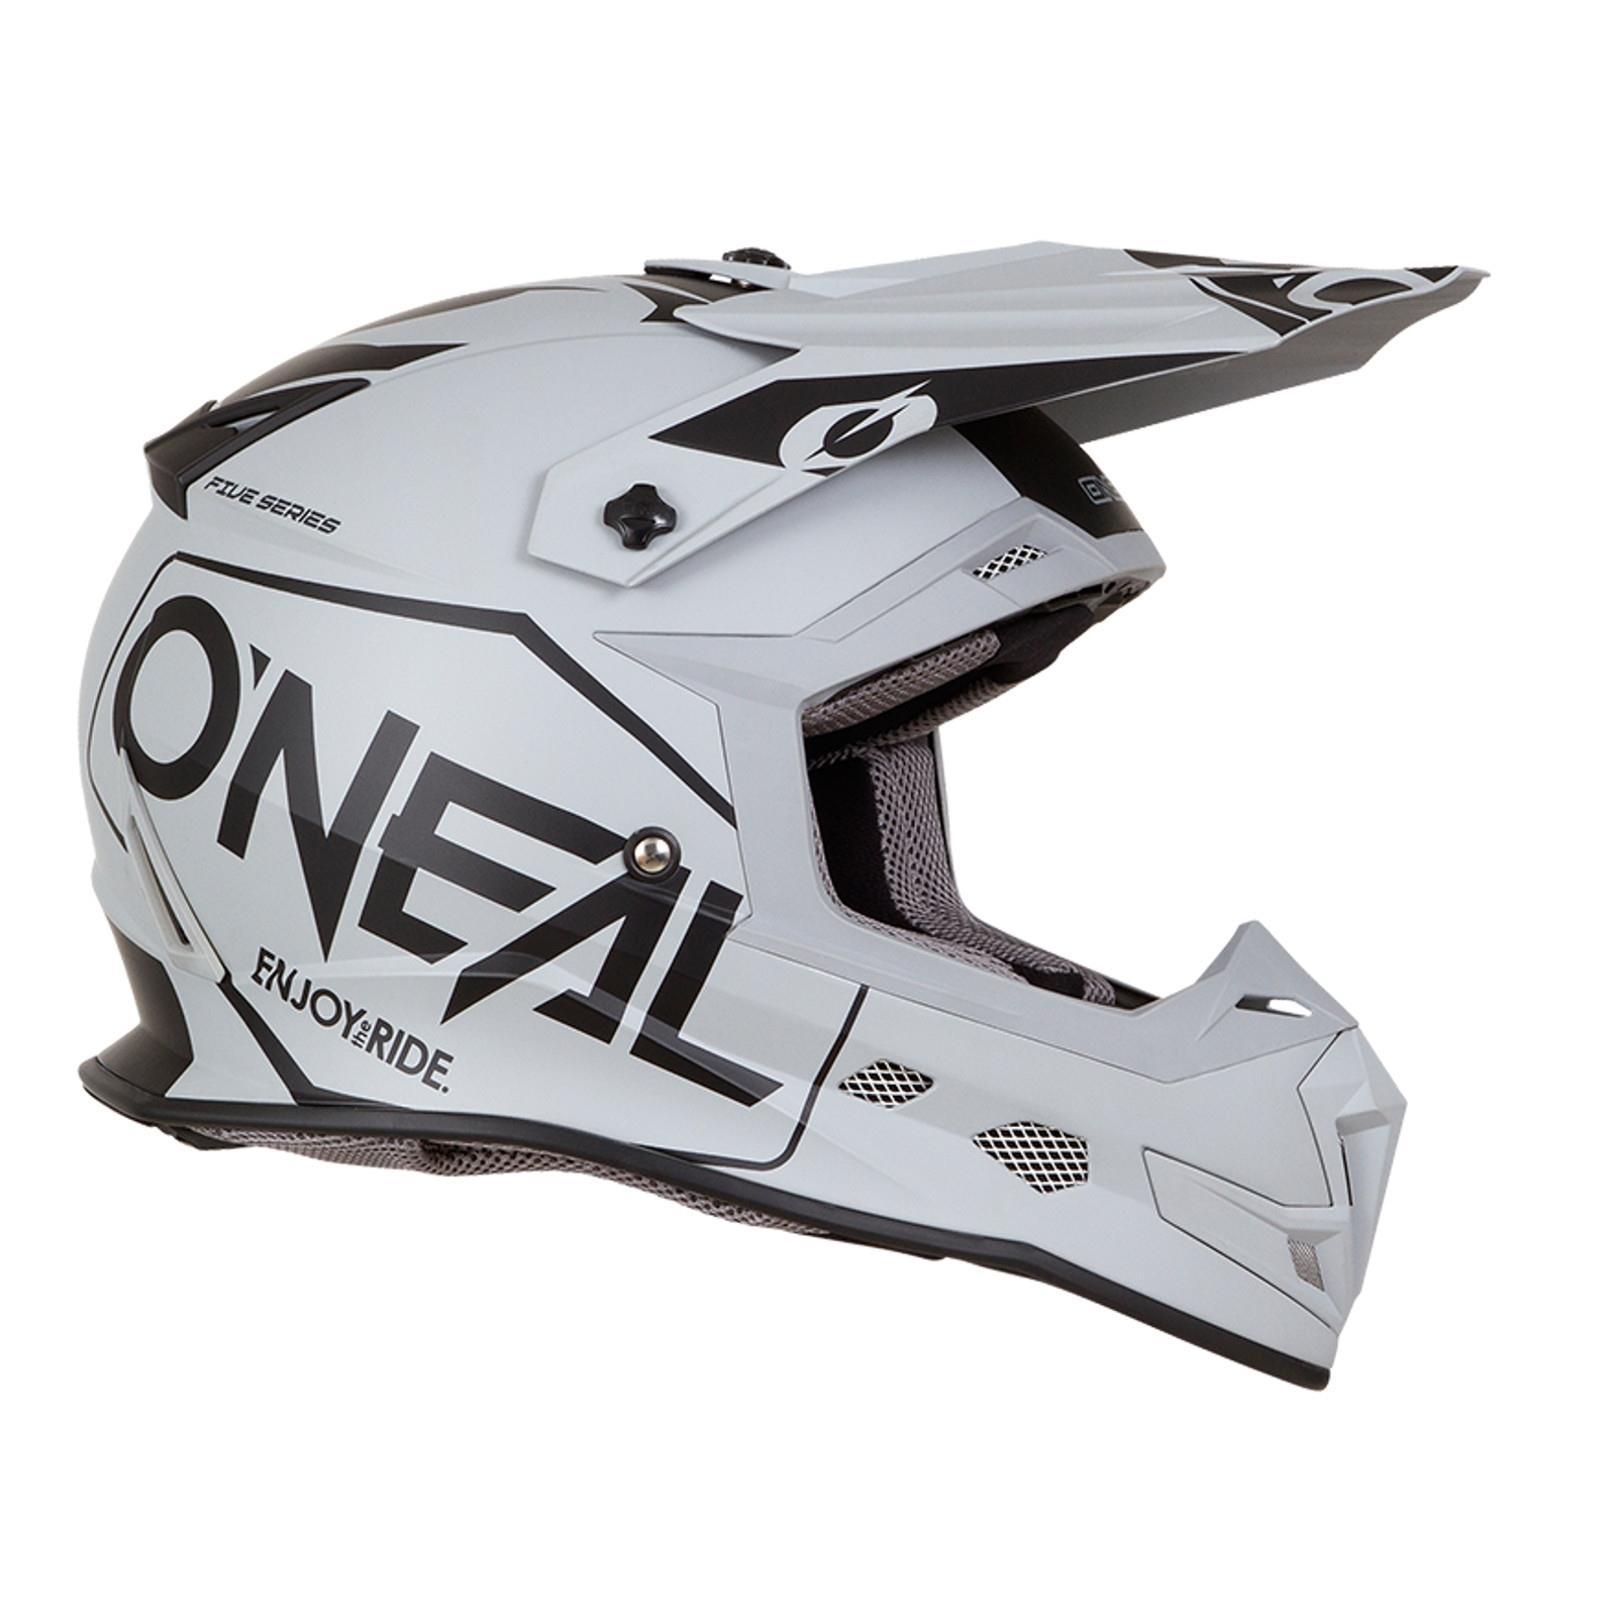 ONeal-Motocross-casco-MX-ENDURO-MOTO-BICI-FUORISTRADA-CROSS-Series-Adventure miniatura 71